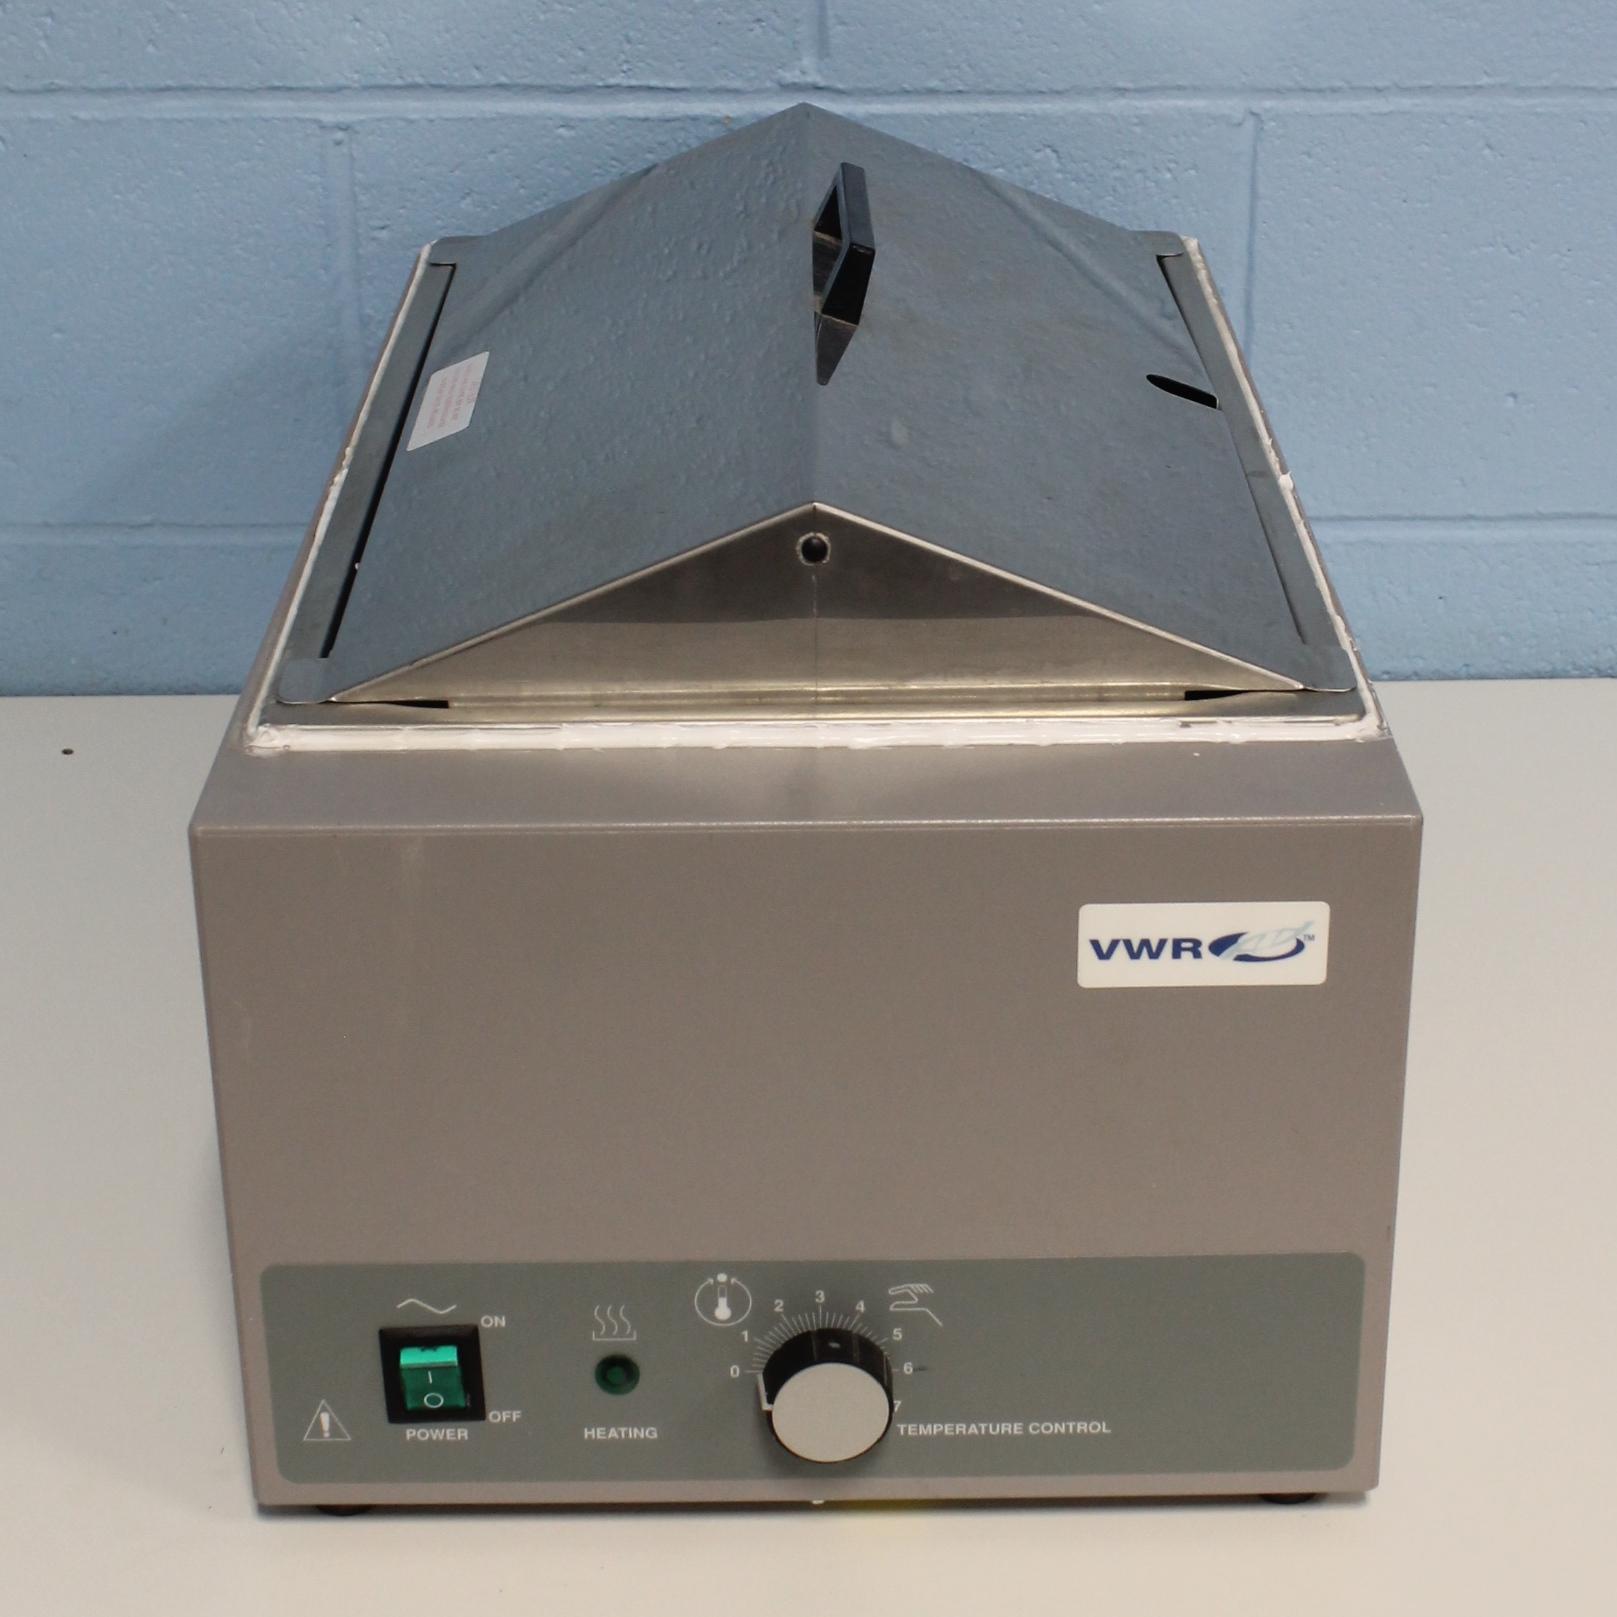 VWR / Sheldon 1213 Heated Water Bath Image